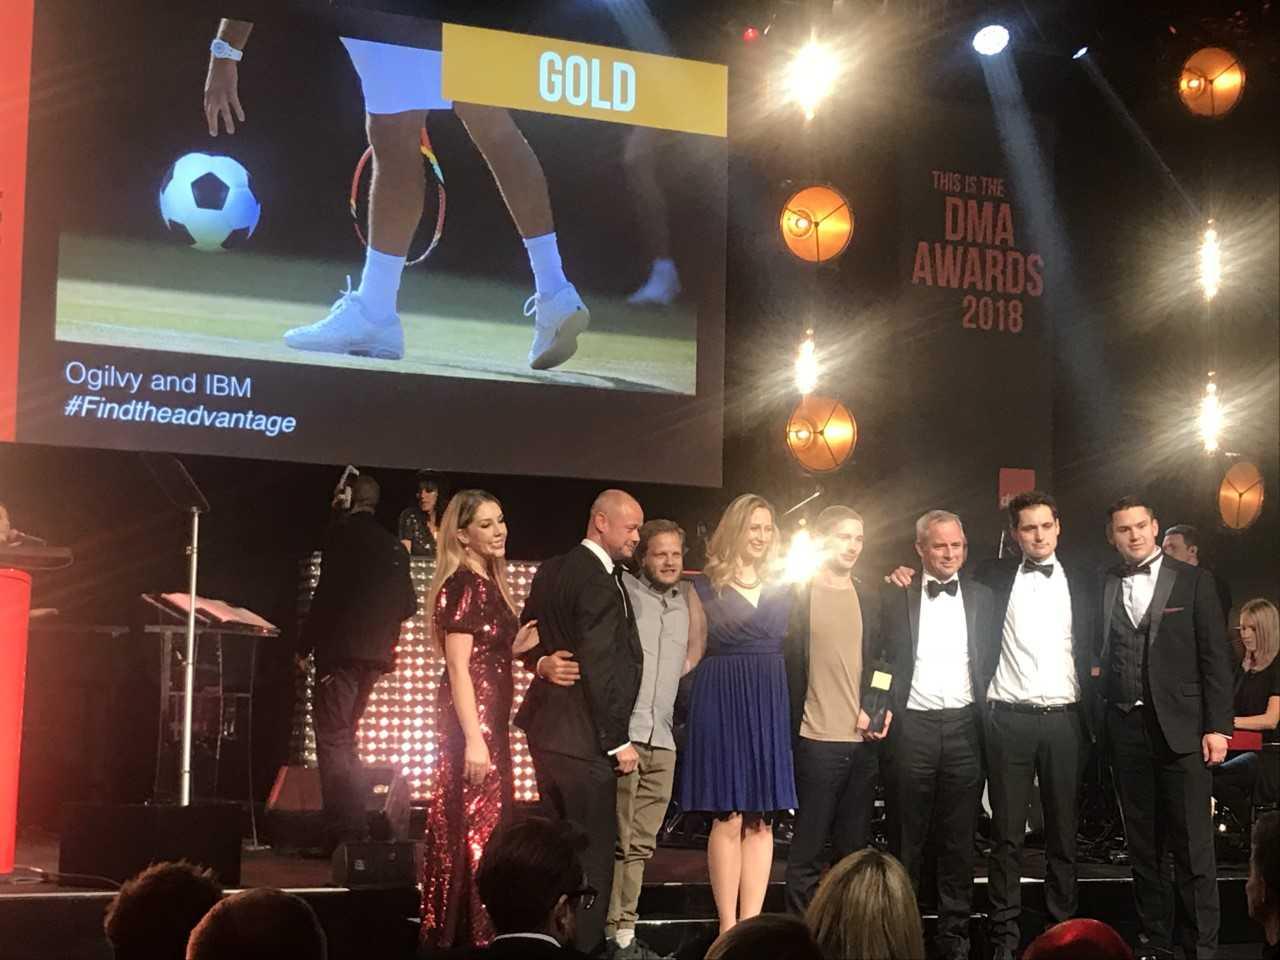 Ogilvy UK Wins 14 Awards, Becoming Most Awarded Agency at the DMAs 2018